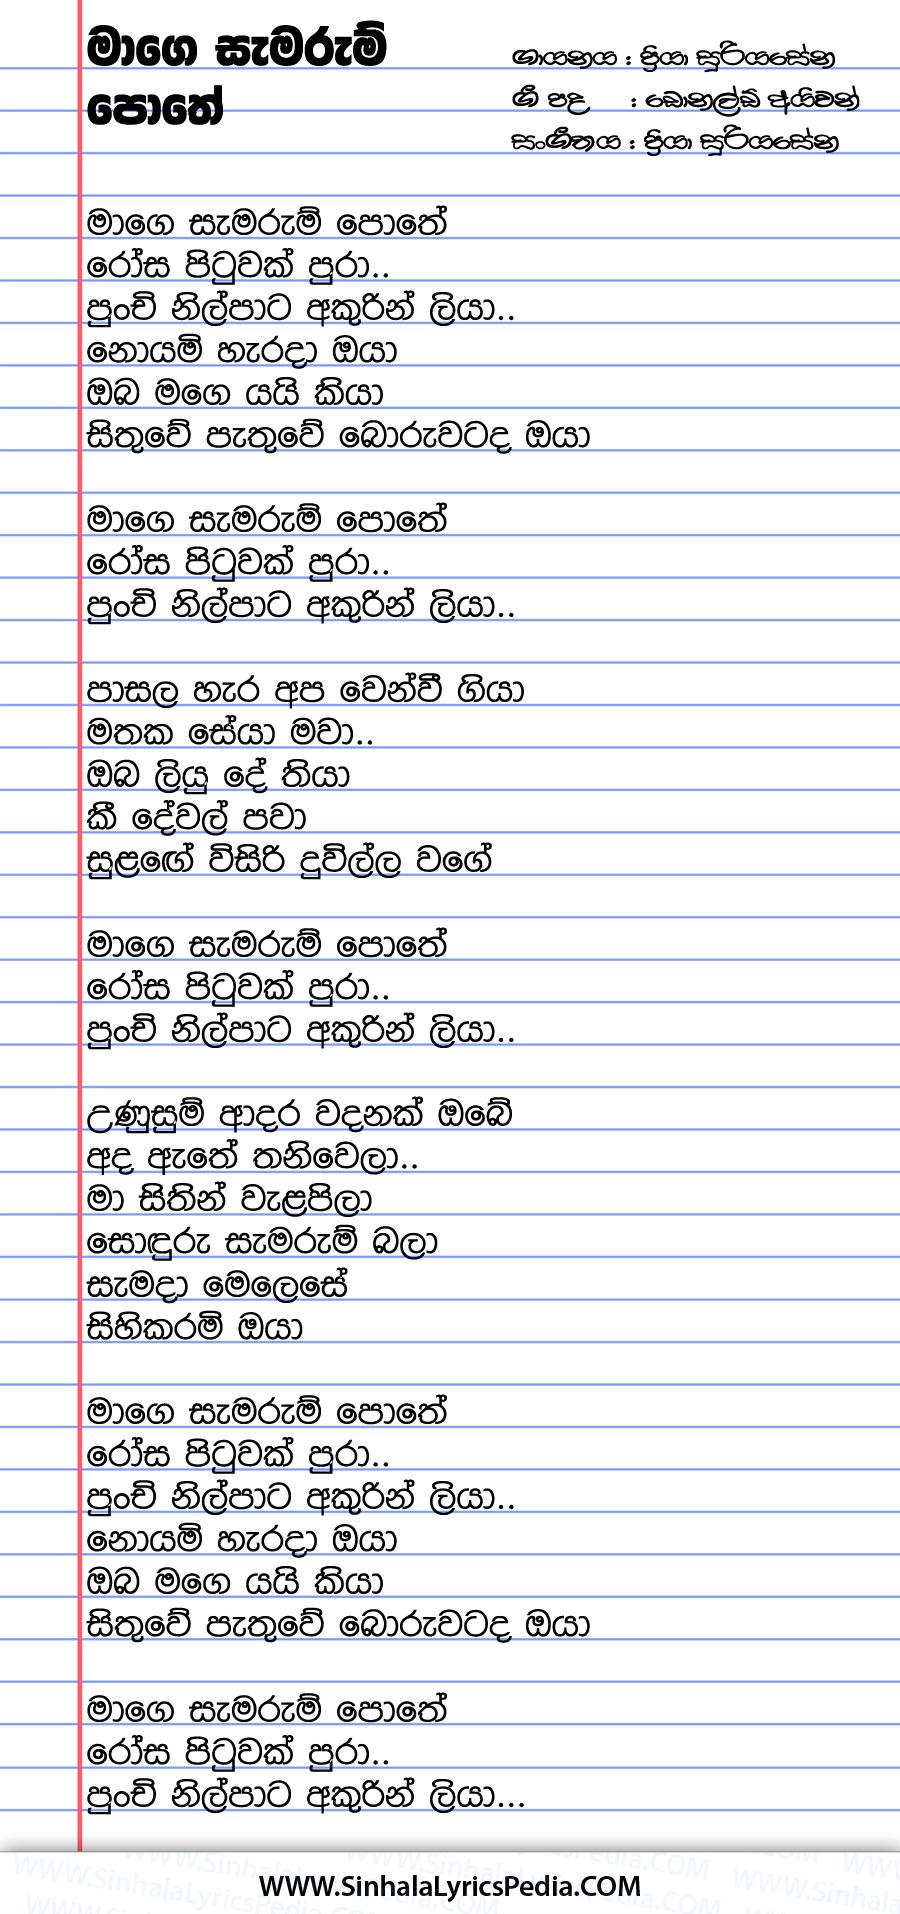 Mage Samarum Pothe Song Lyrics